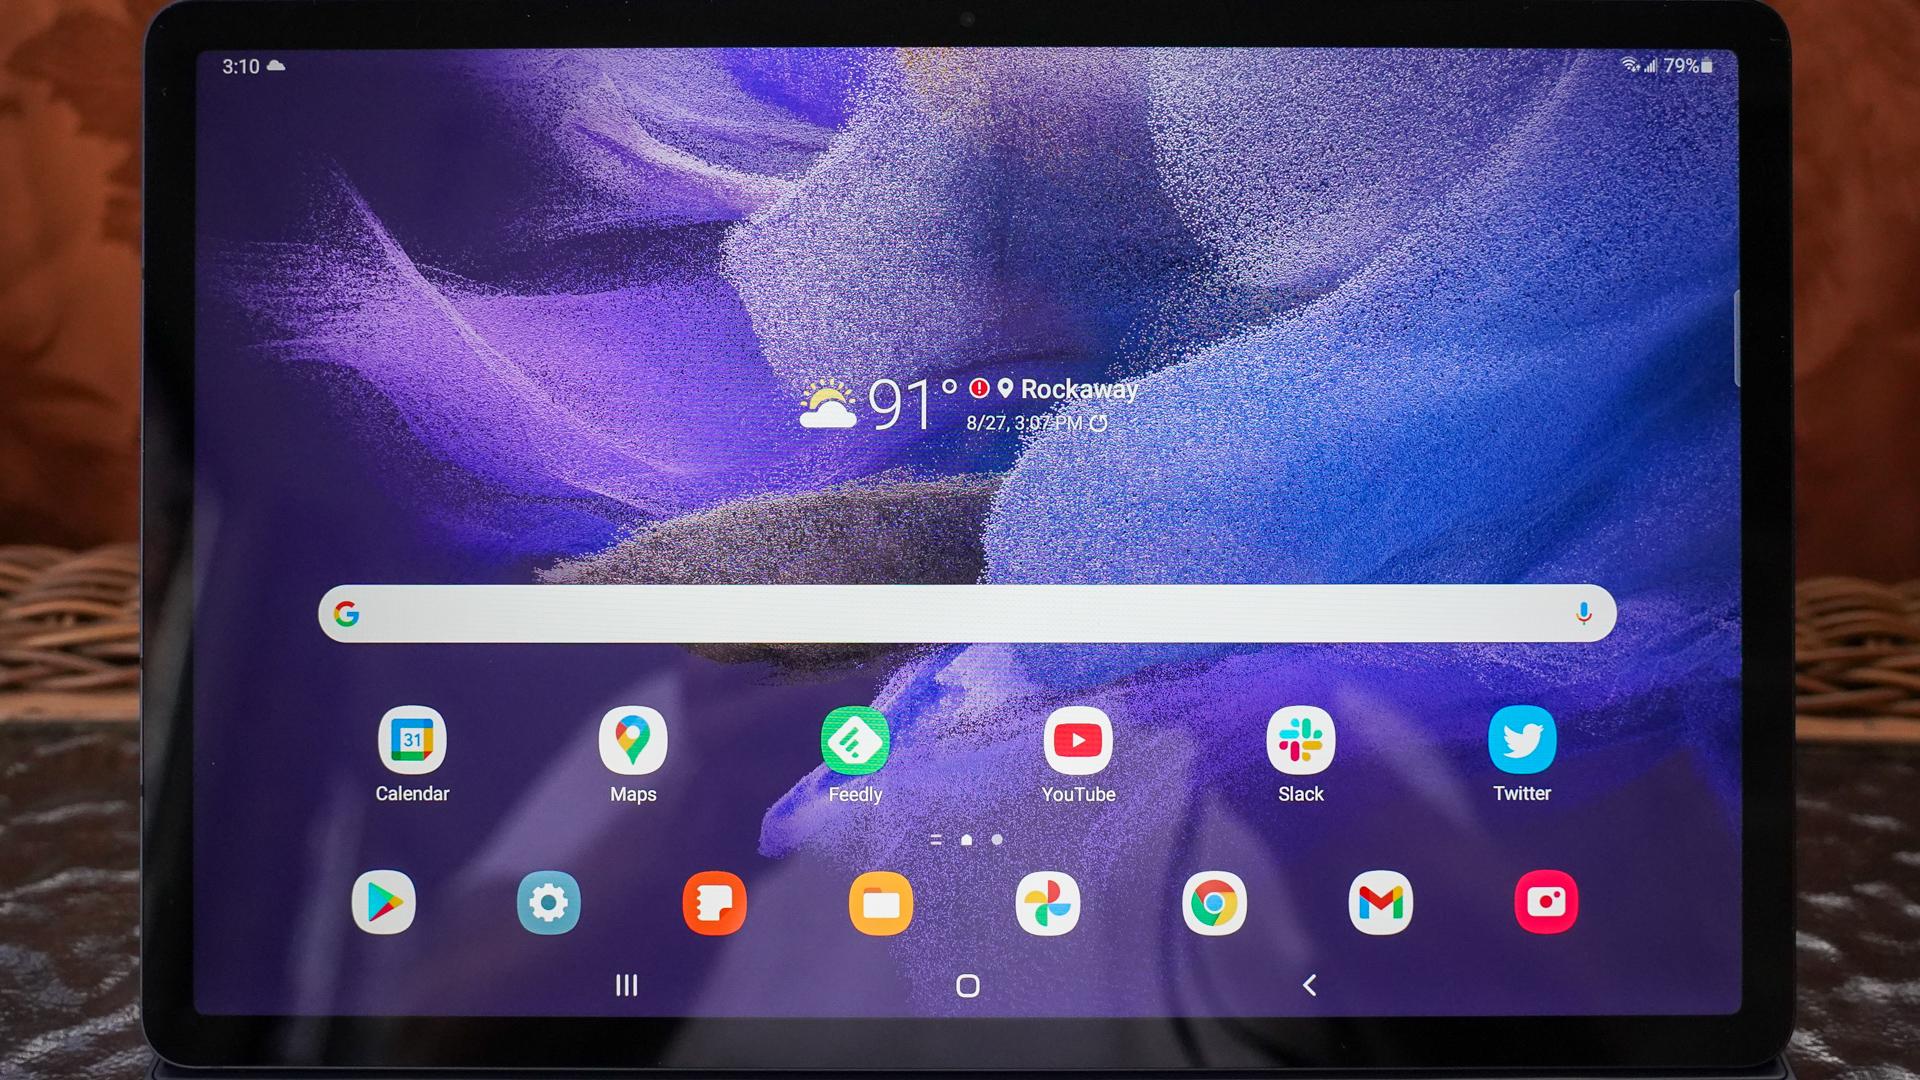 Samsung Galaxy Tab S7 FE display with home screen